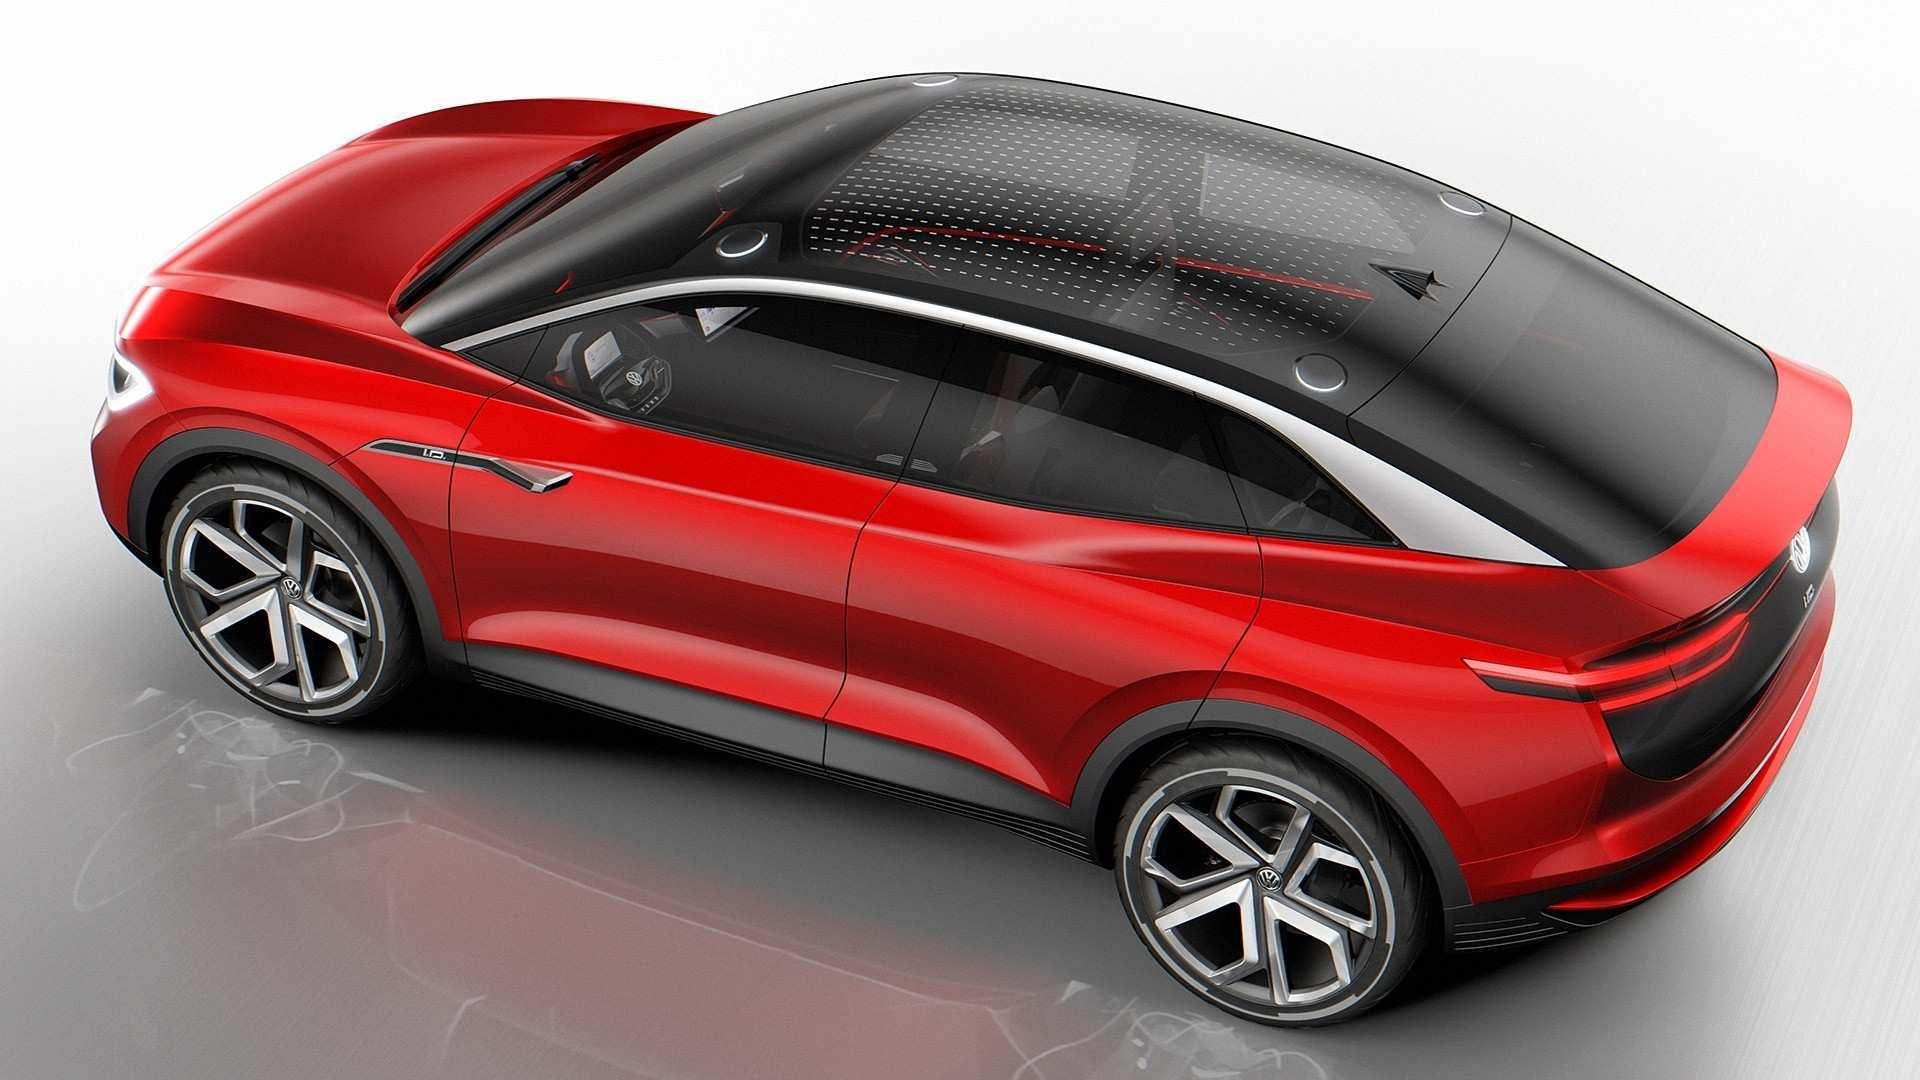 83 New Volkswagen Elettrica 2020 Spesification with Volkswagen Elettrica 2020